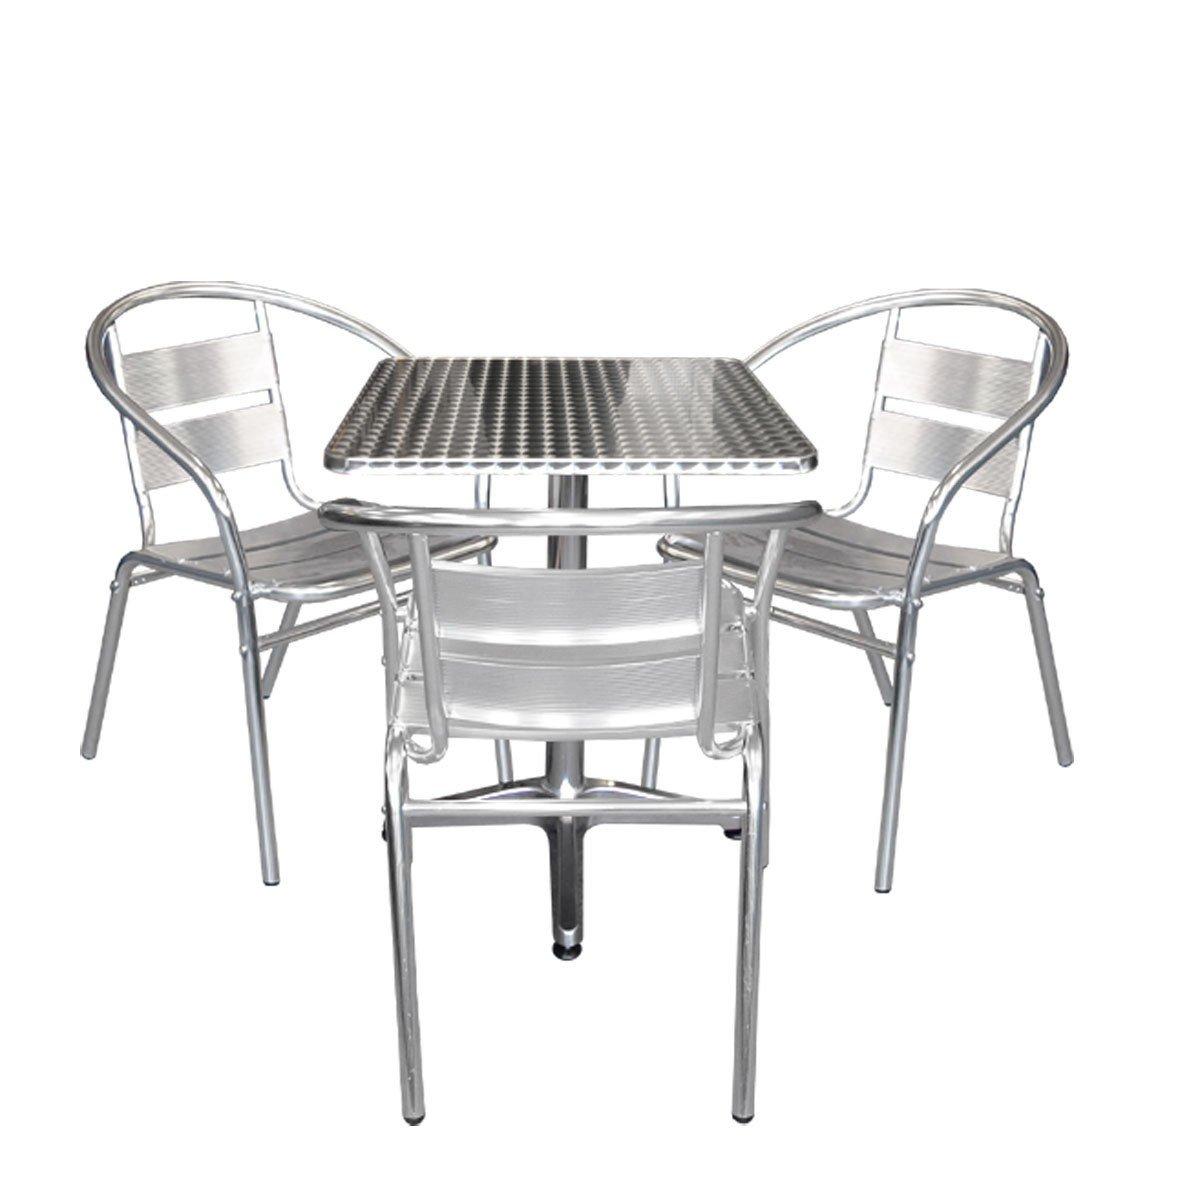 4tlg. Aluminium Bistro-Set Balkonmöbel Stapelstuhl günstig online kaufen